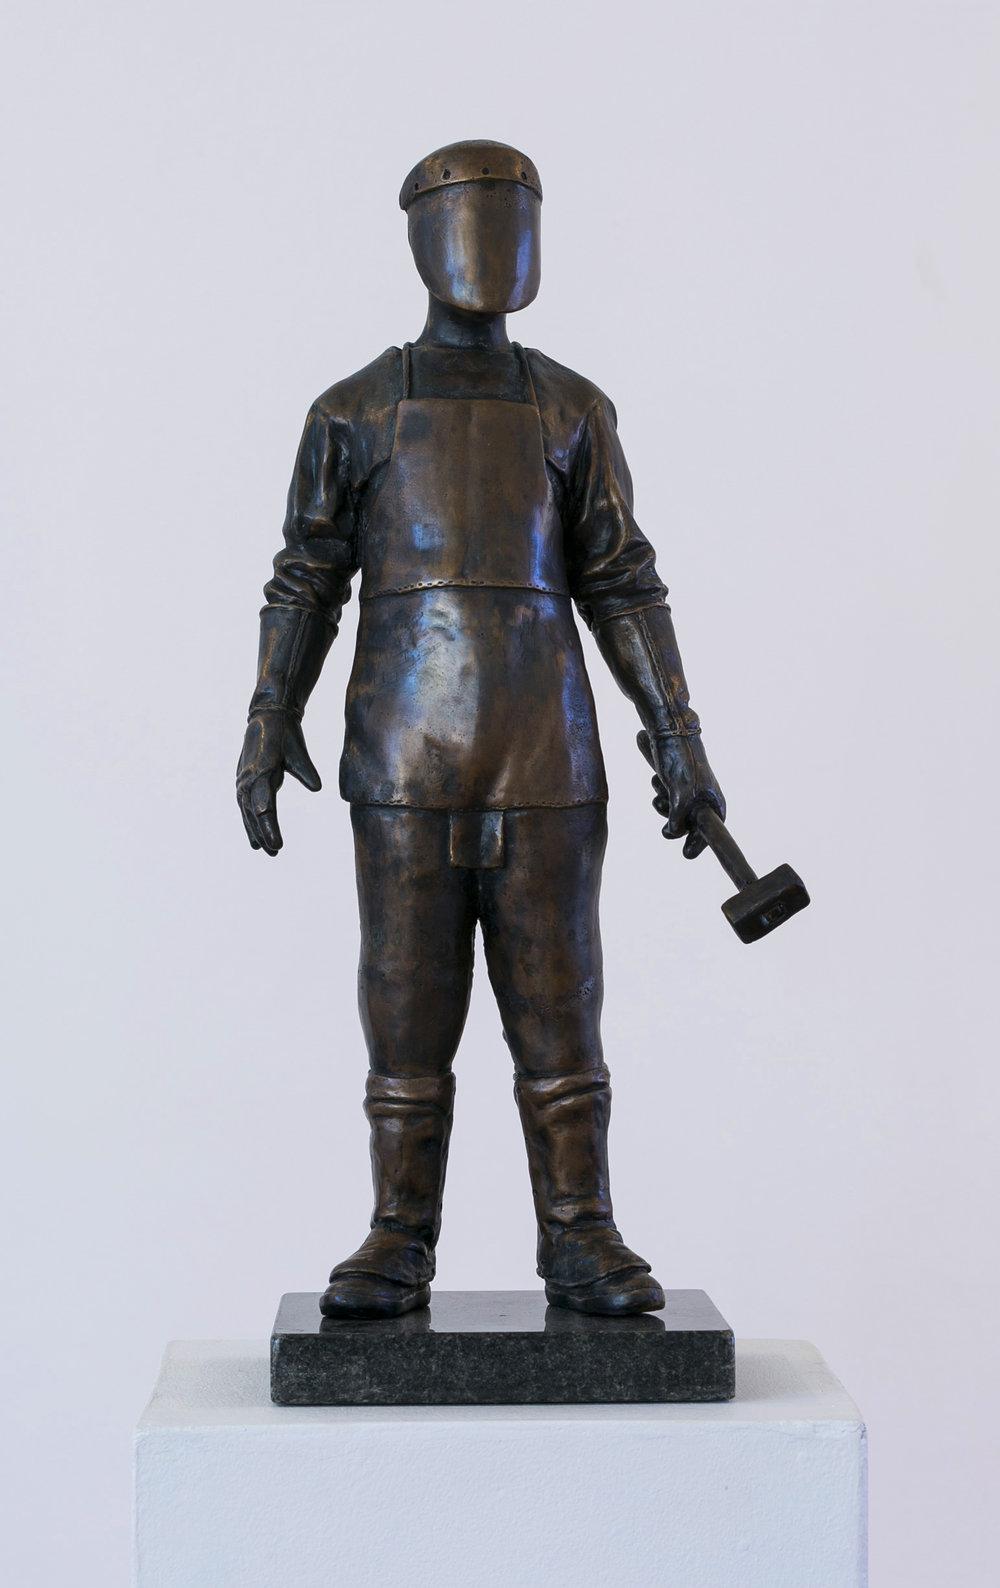 Jonathan van der Walt  The Craftsman  Bronze or resin, edition of 18  26 x 16 x 54 cm